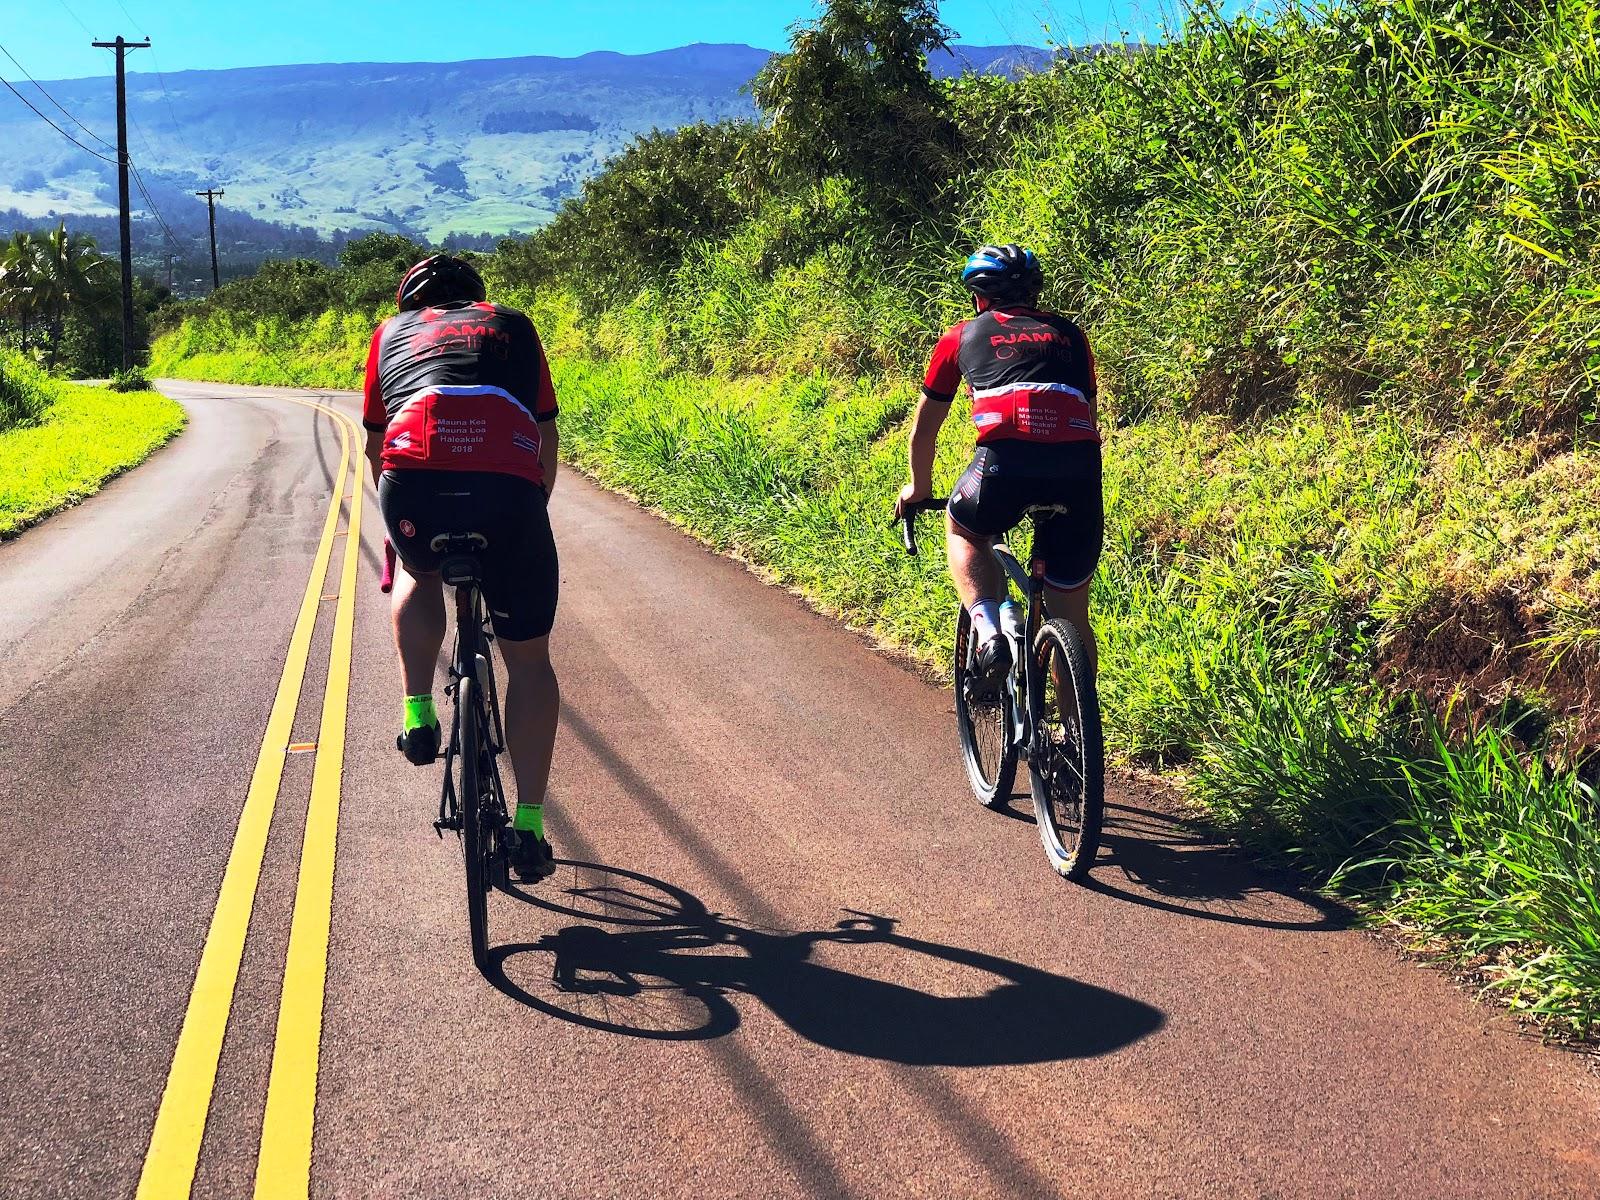 Cycling up Pulehu Road on way to Waipoli Road